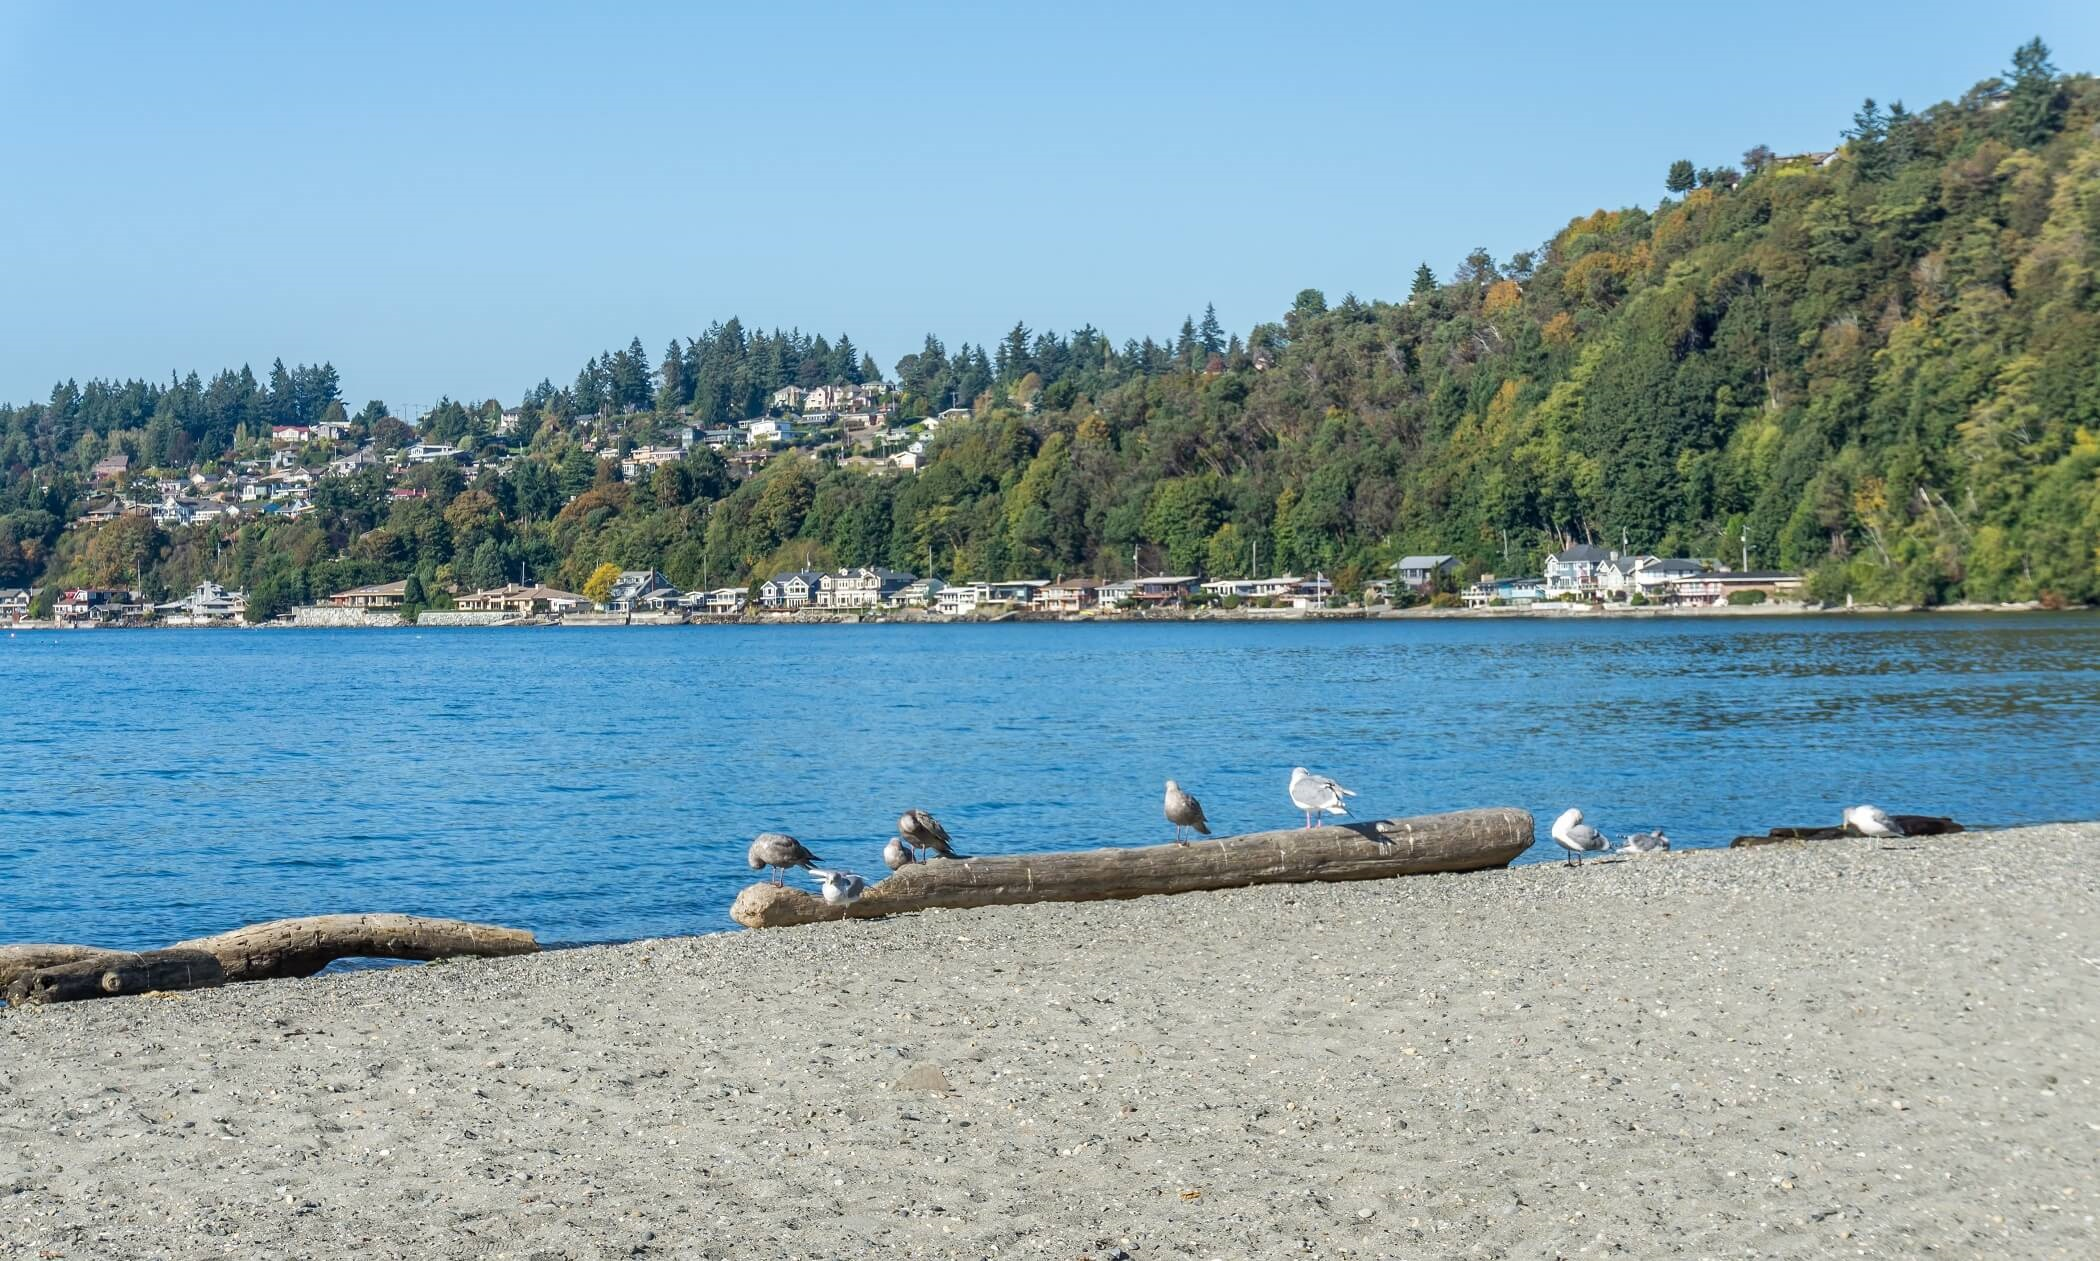 Puget Sound Waterfront Homes - Puget Sound, WA Real Estate